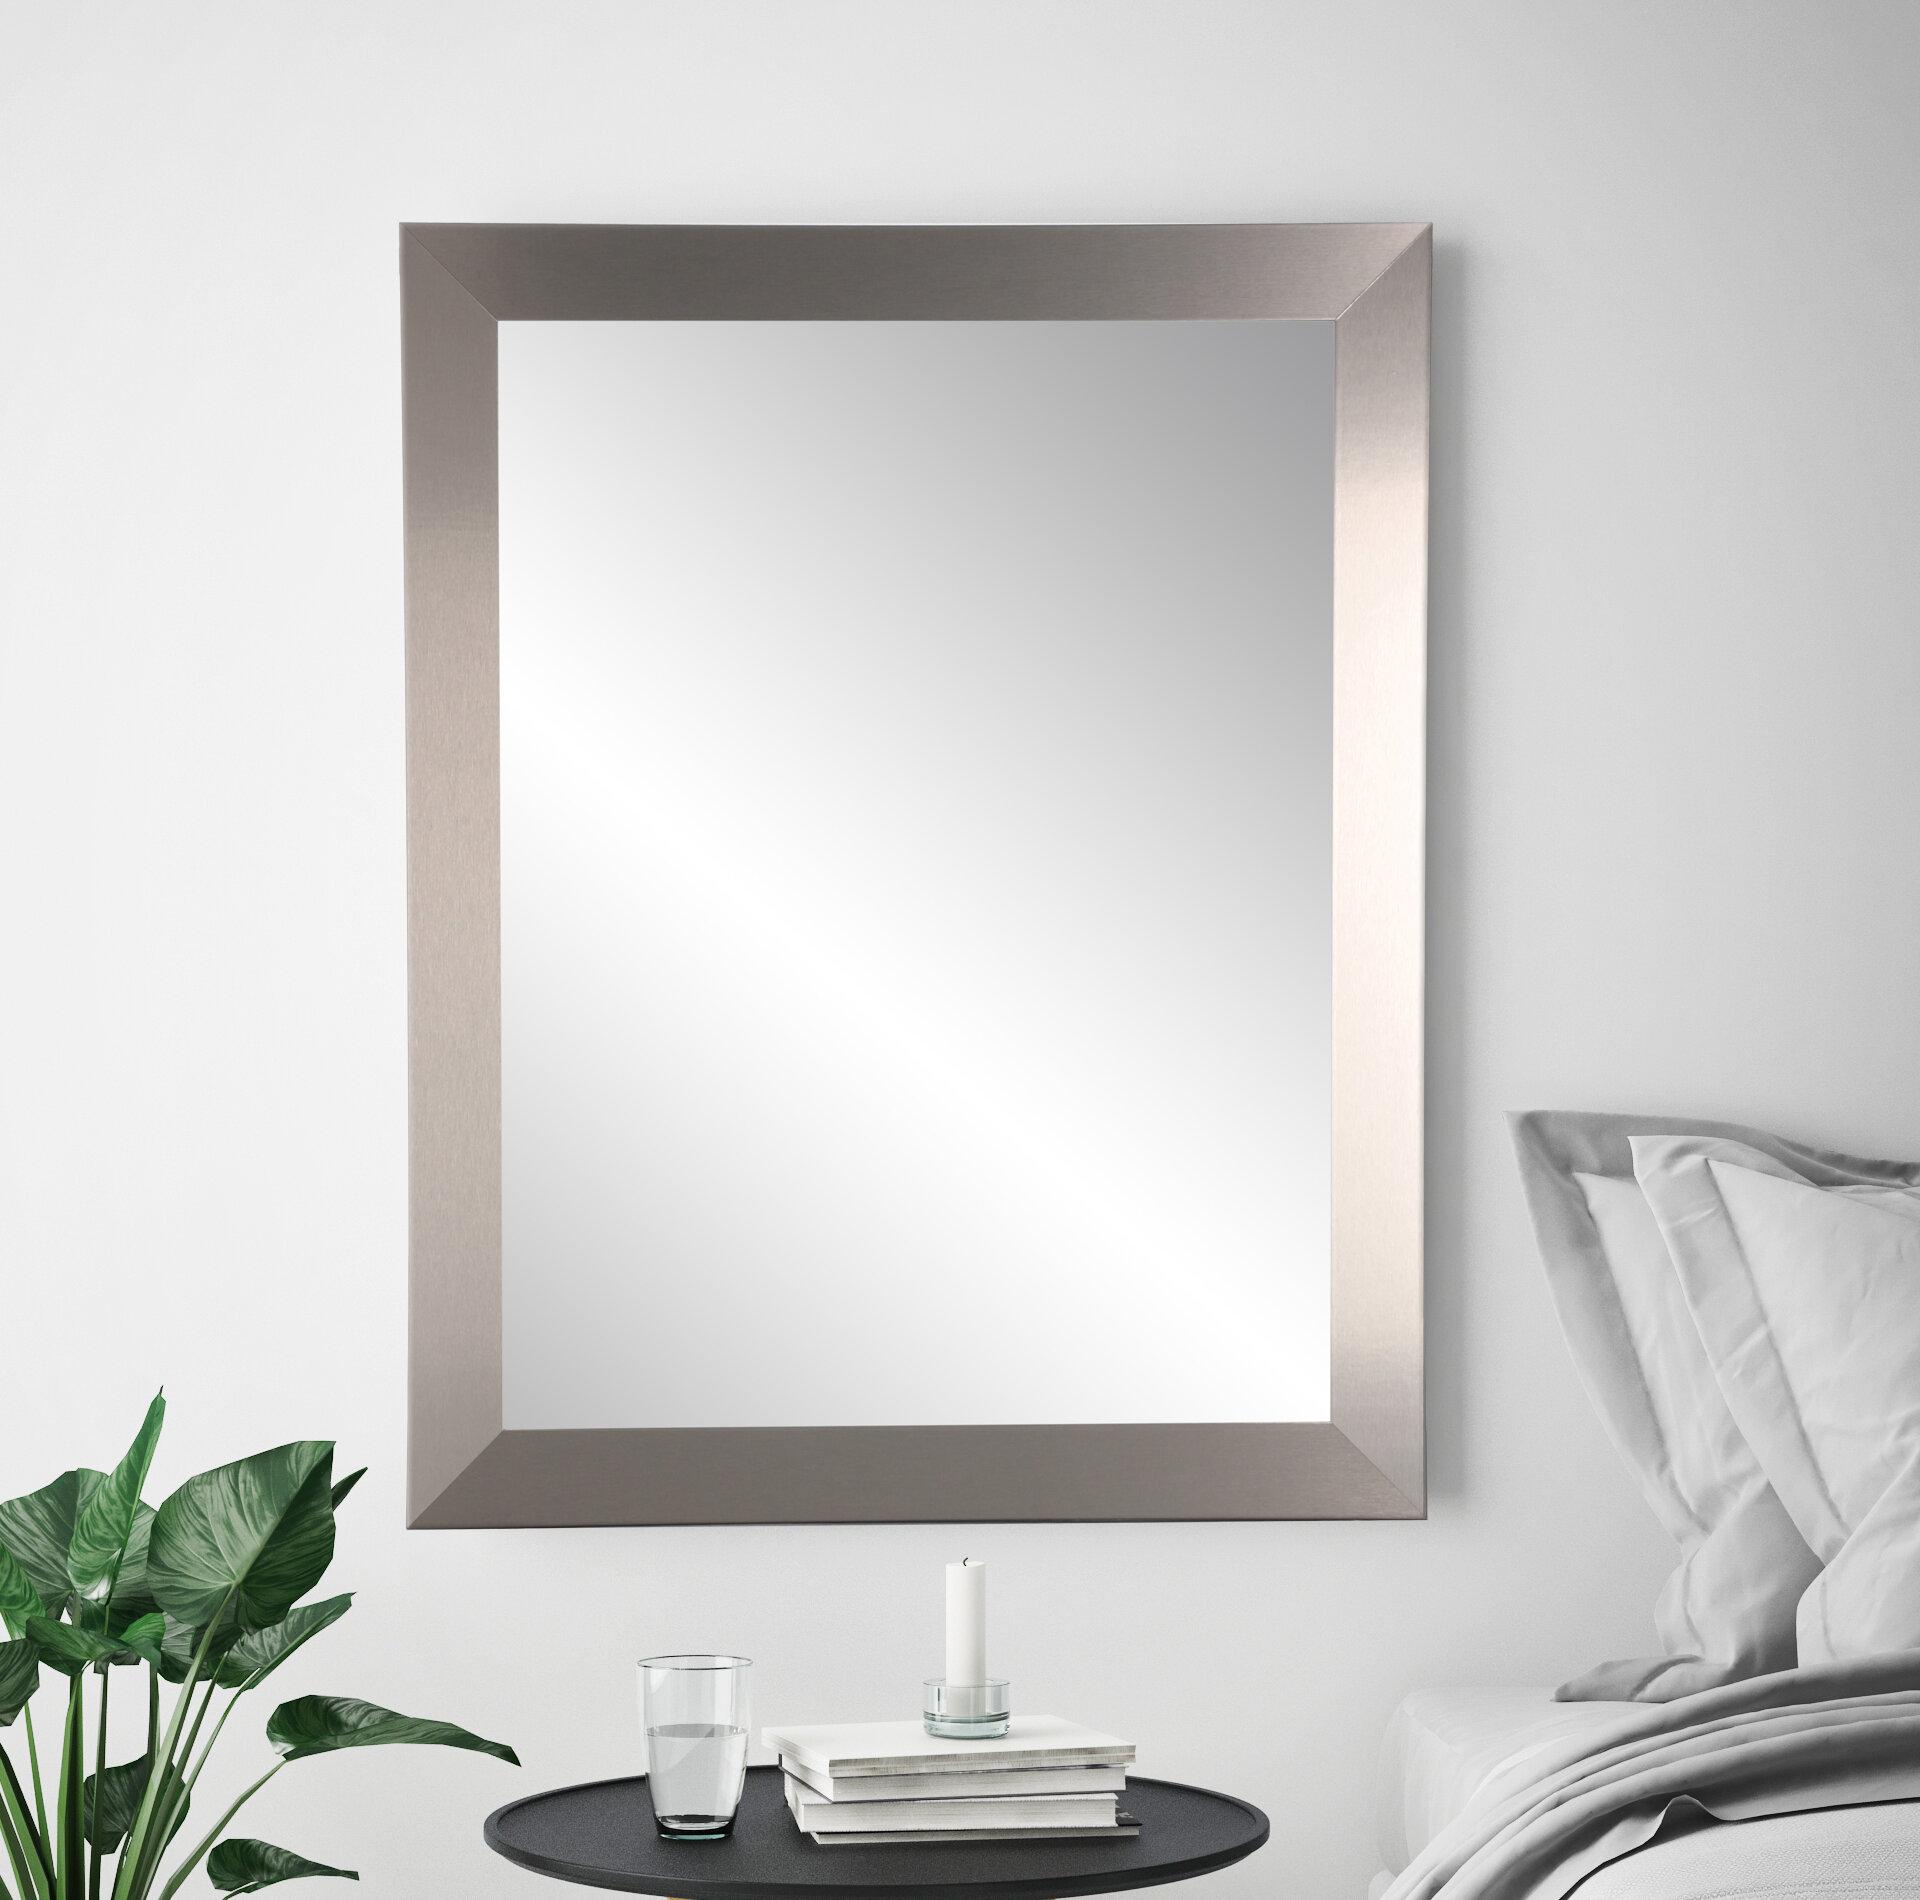 Orren Ellis Olivia Industrial Modern Home Accent Wall Mirror Reviews